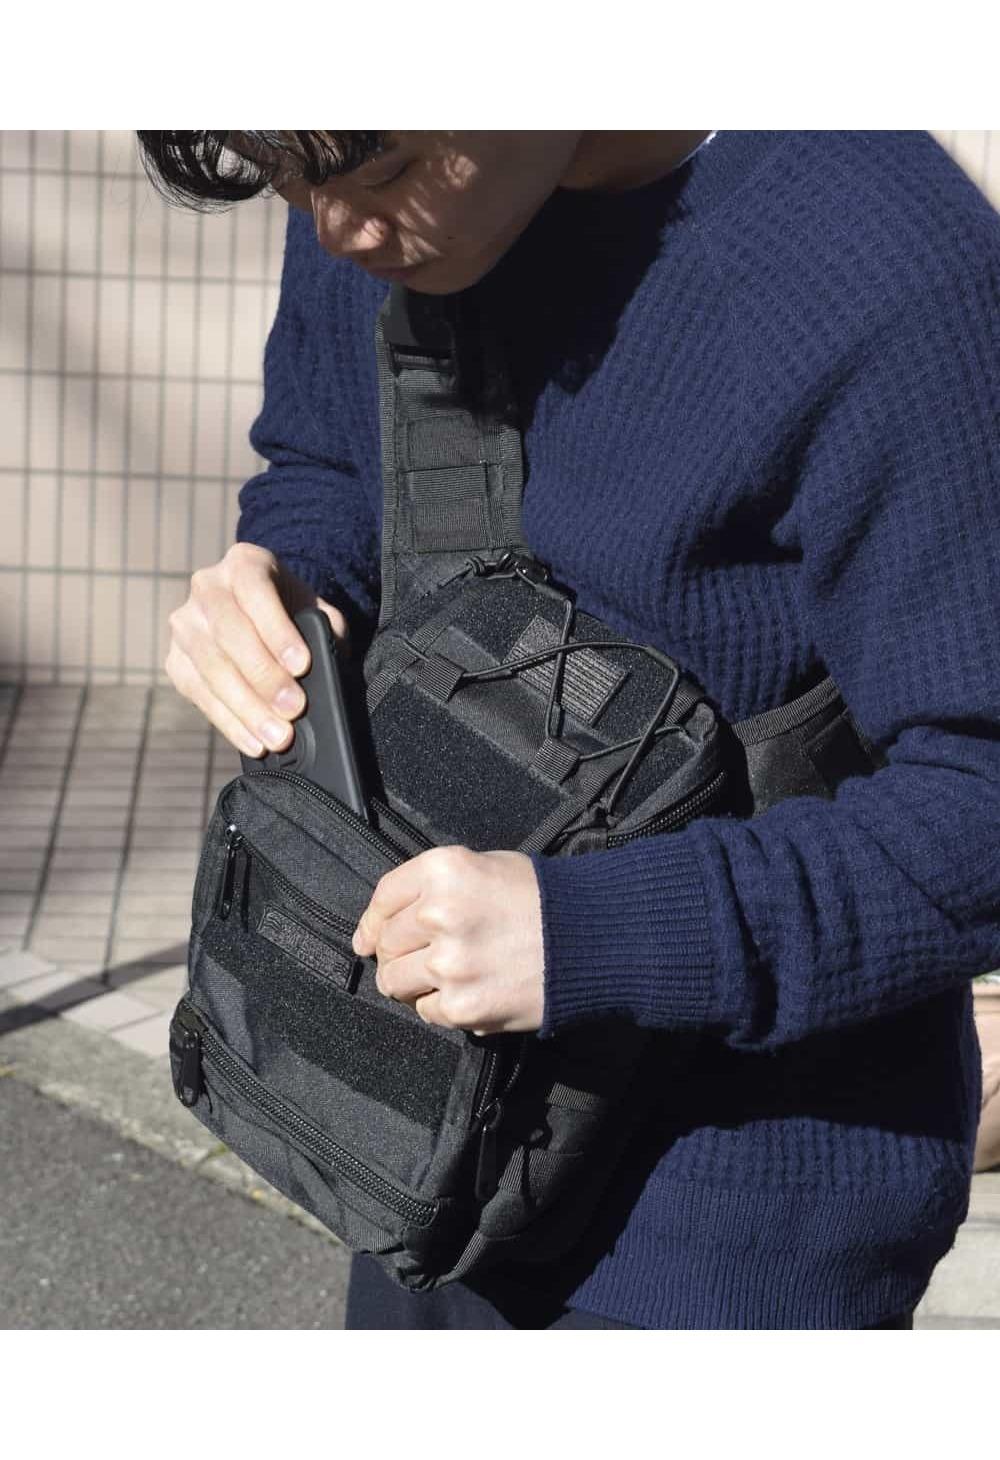 a9d410f29958 MK MICHEL KLEIN homme|【MIL SPEC】ショルダーバッグ|ファッション ...